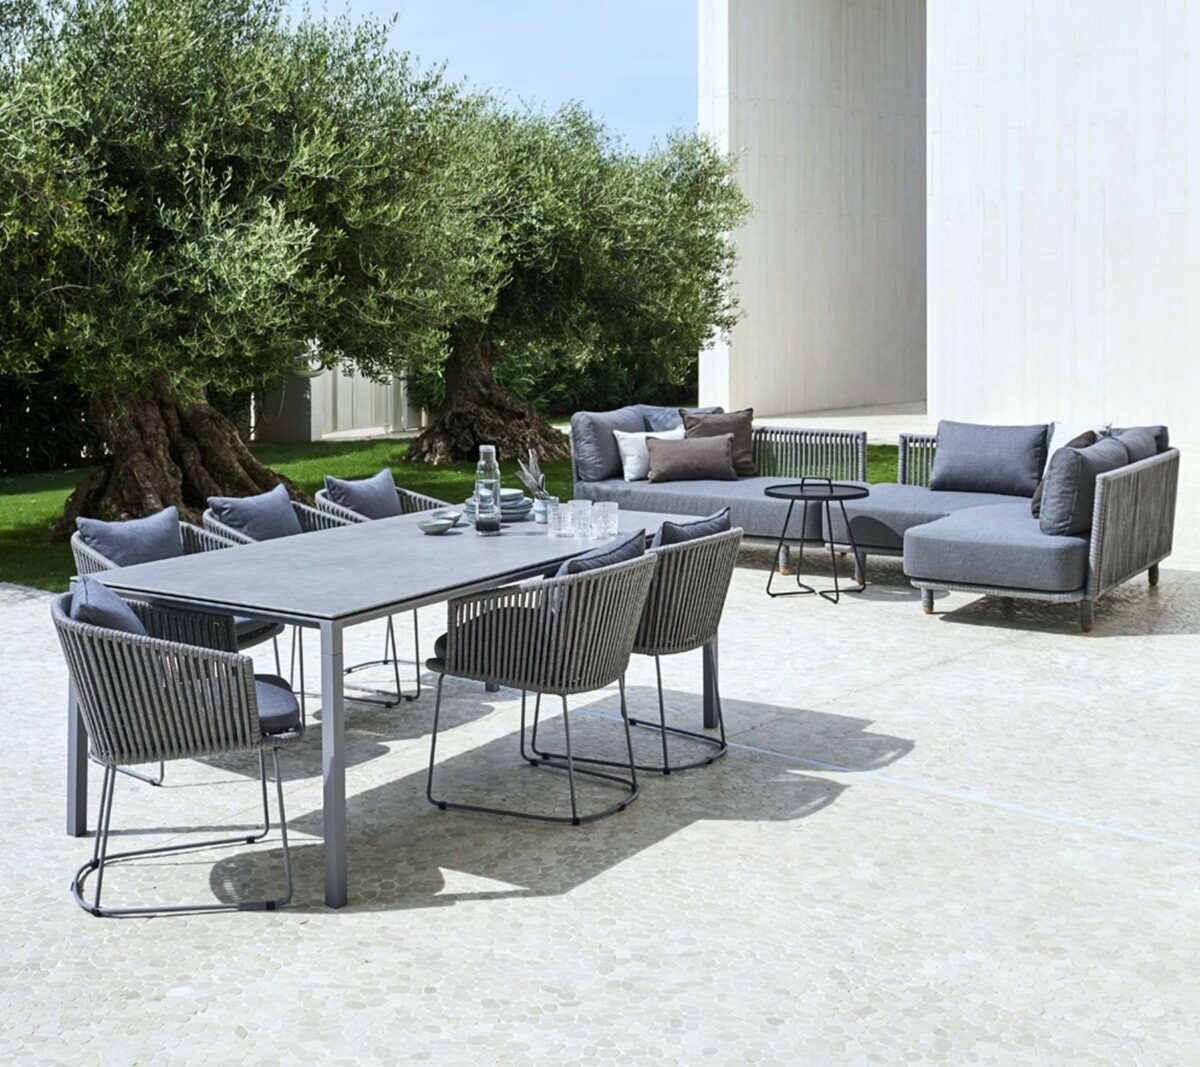 Moments 0008 Moments chair pure dining table moments lounge modul 1571336101 1ba014fb 7312 4bef b4e5 cbf395e98297